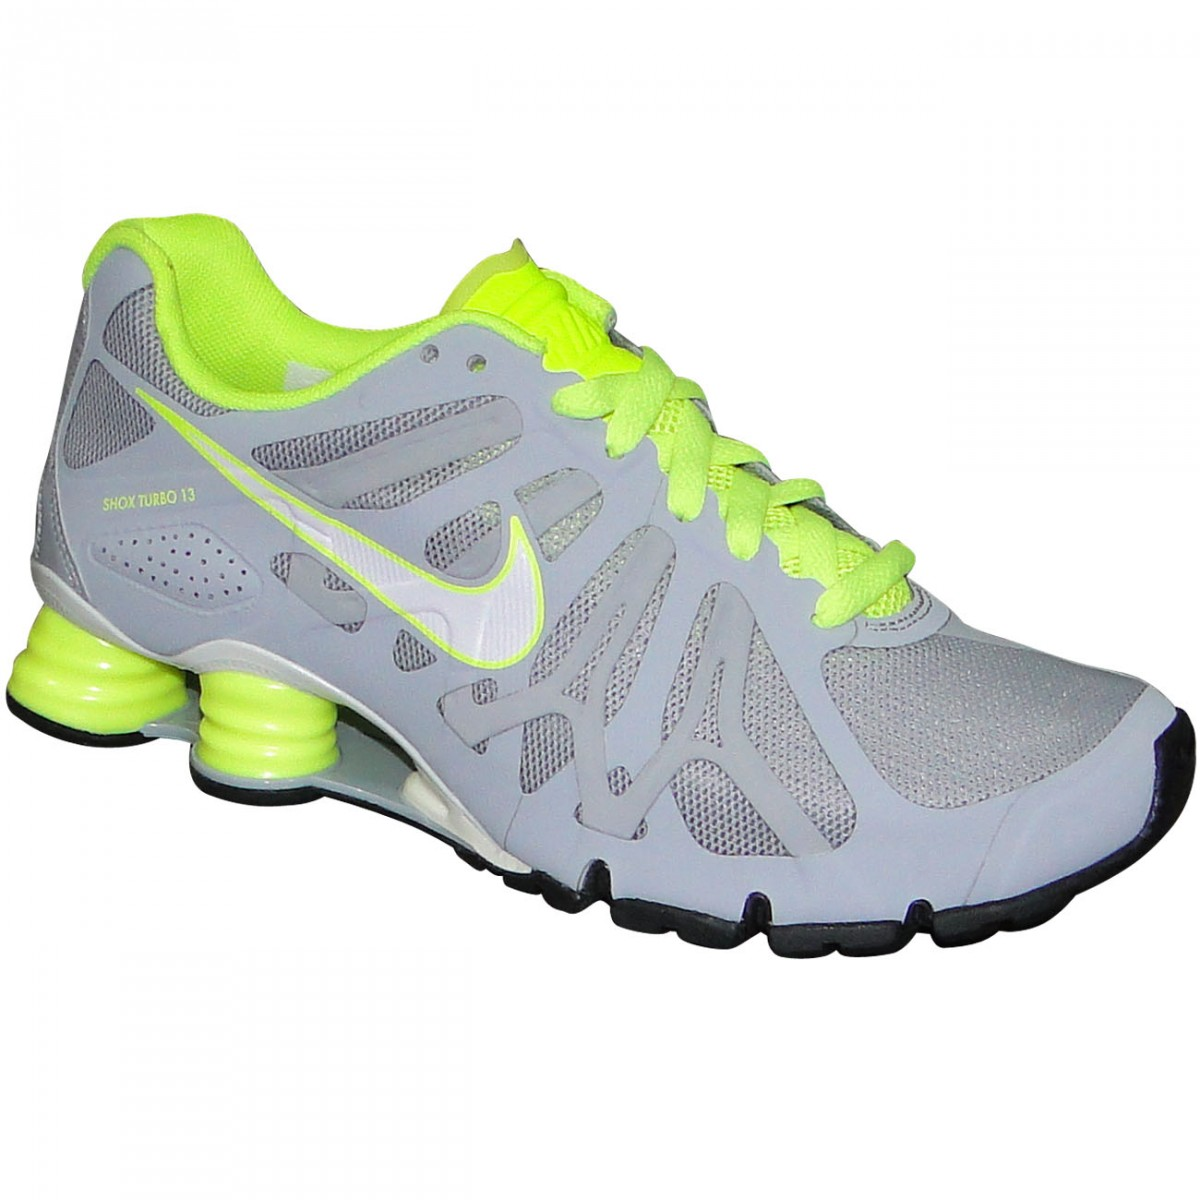 meilleur site web a52a8 7bad4 Tenis Nike Shox Turbo + 13